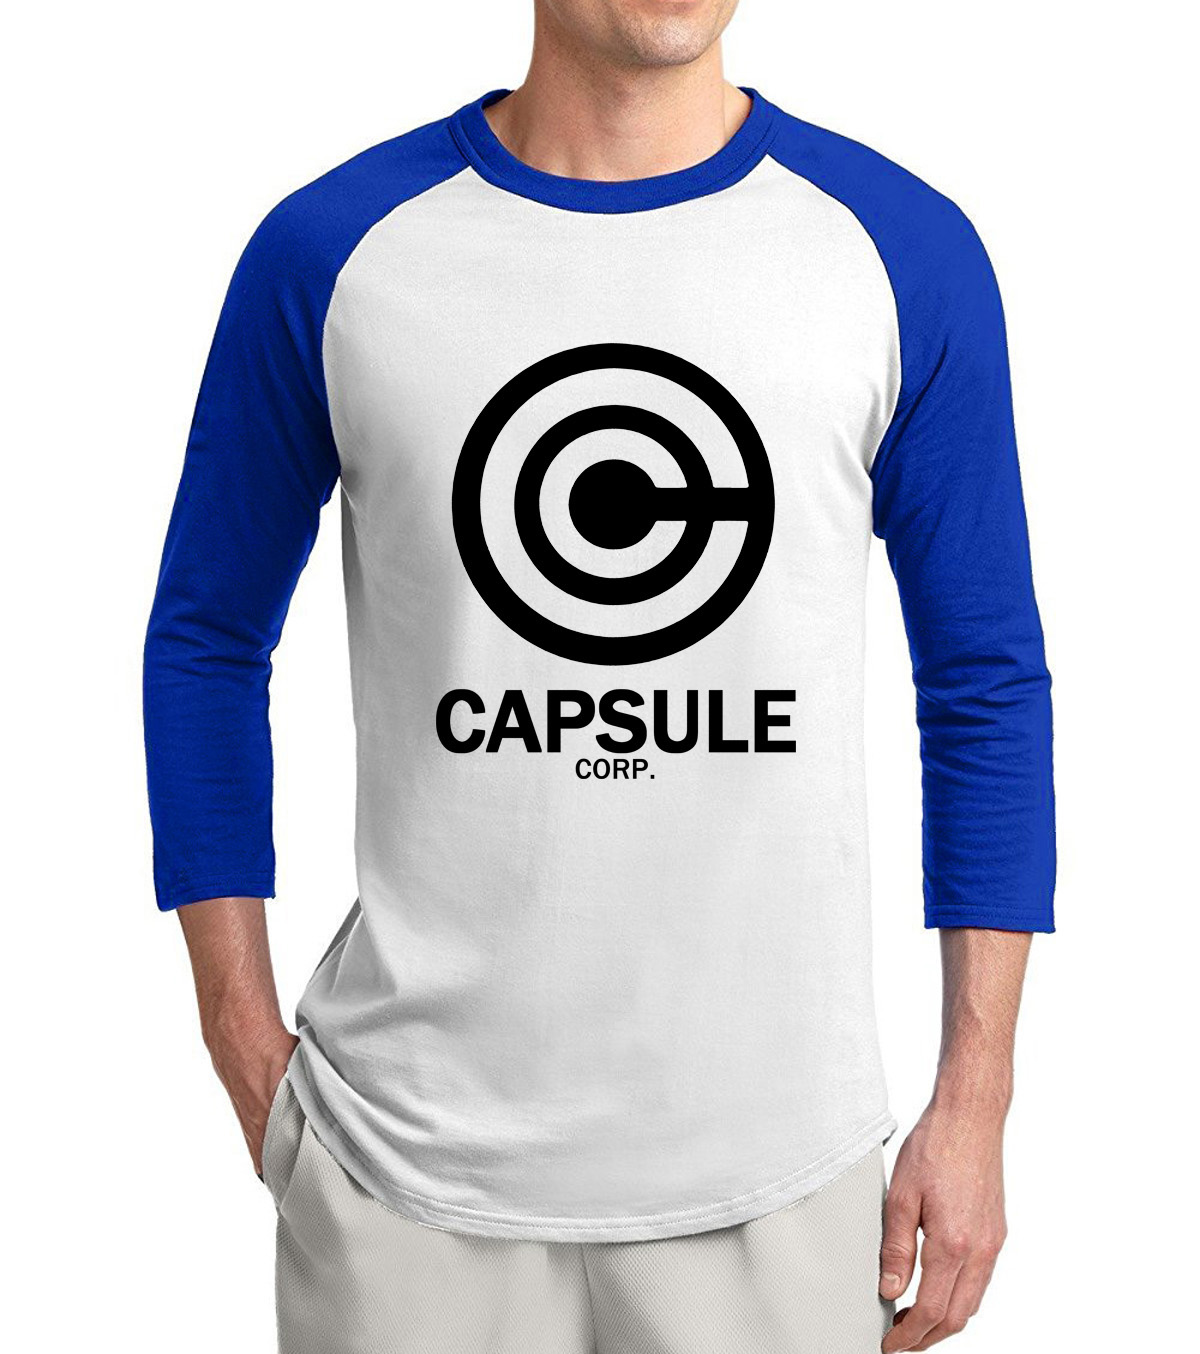 Dragon Ball Capsule Corporation 3/4 Sleeves Sweatshirt